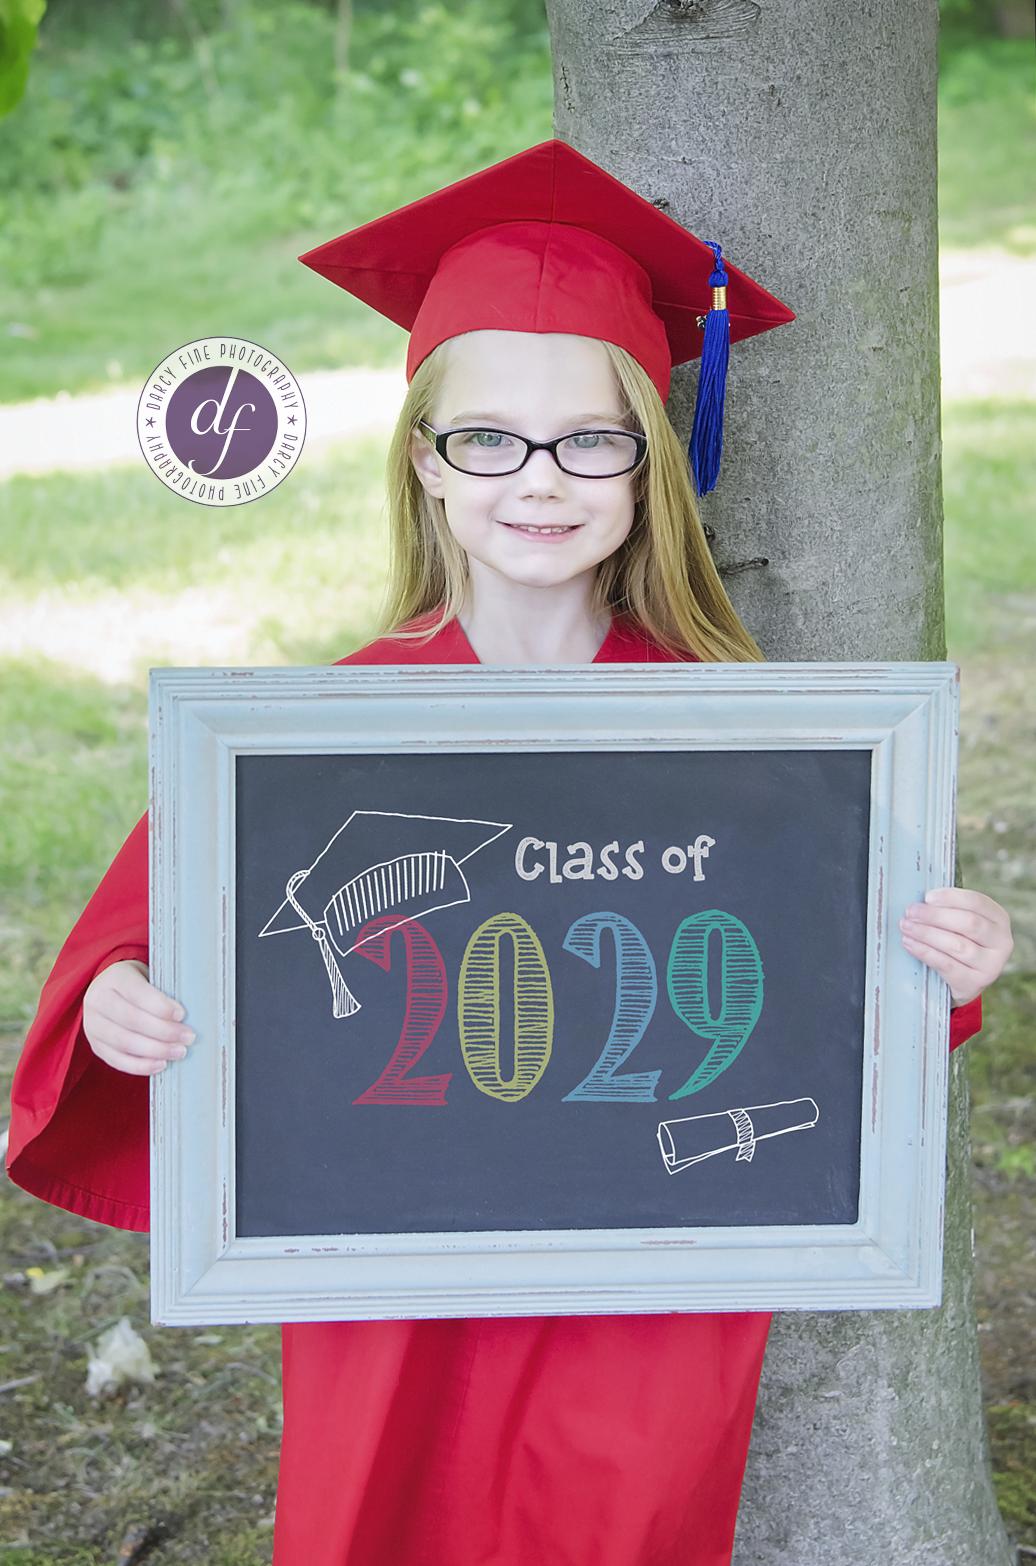 darcy fine photography preschool graduation photography ideas 5